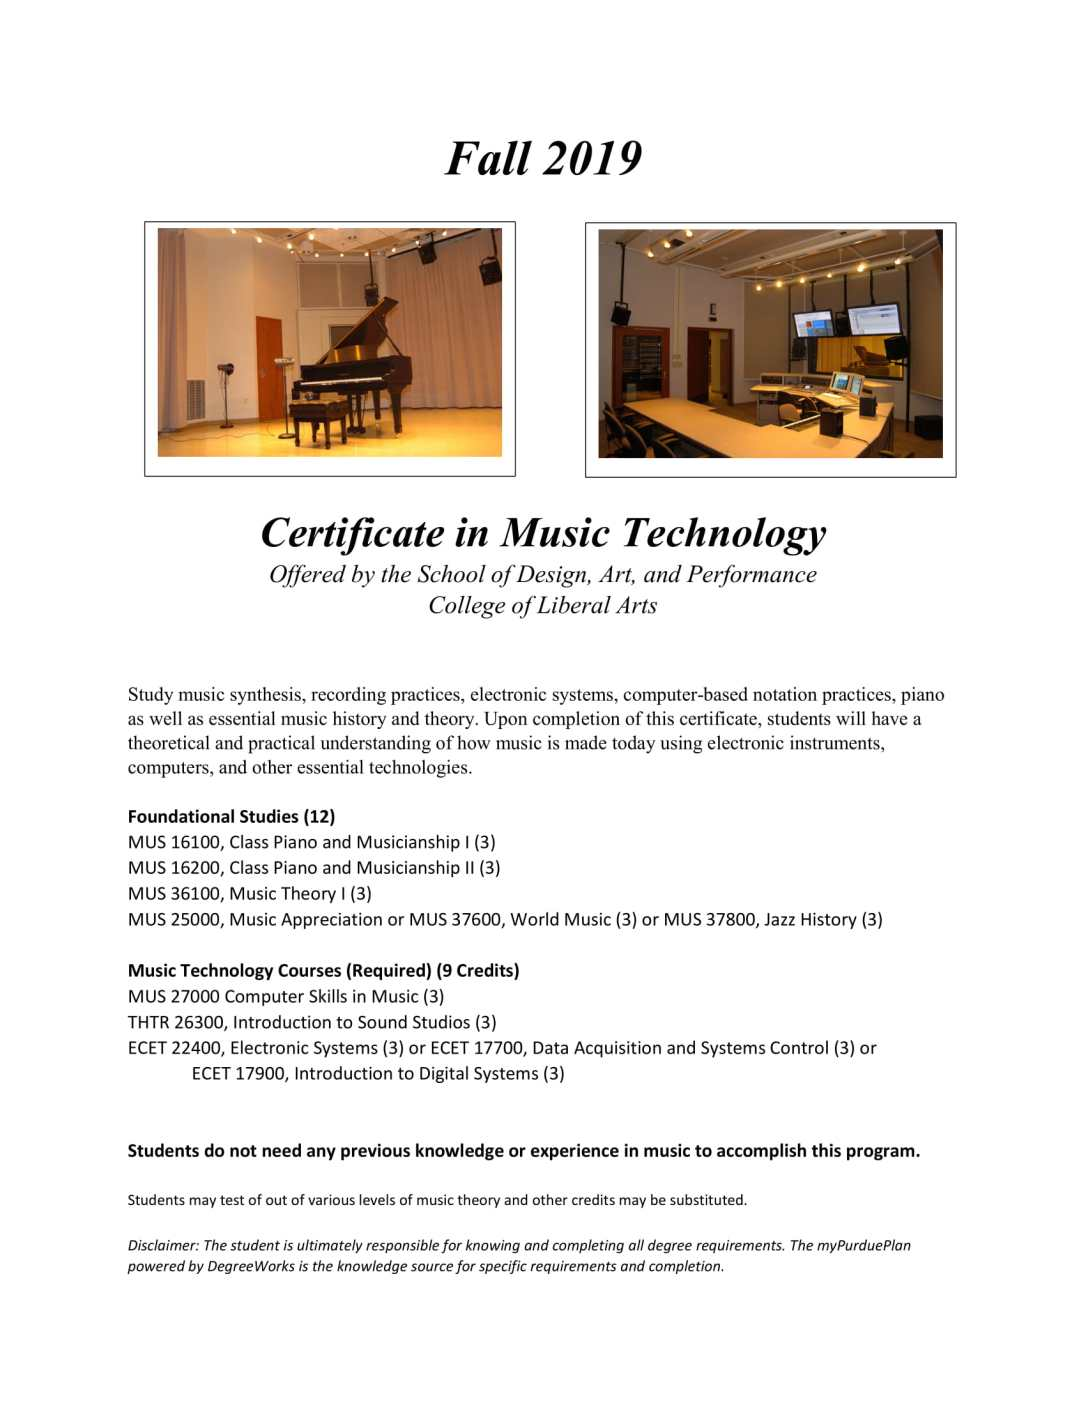 Music Tech Certificate-1